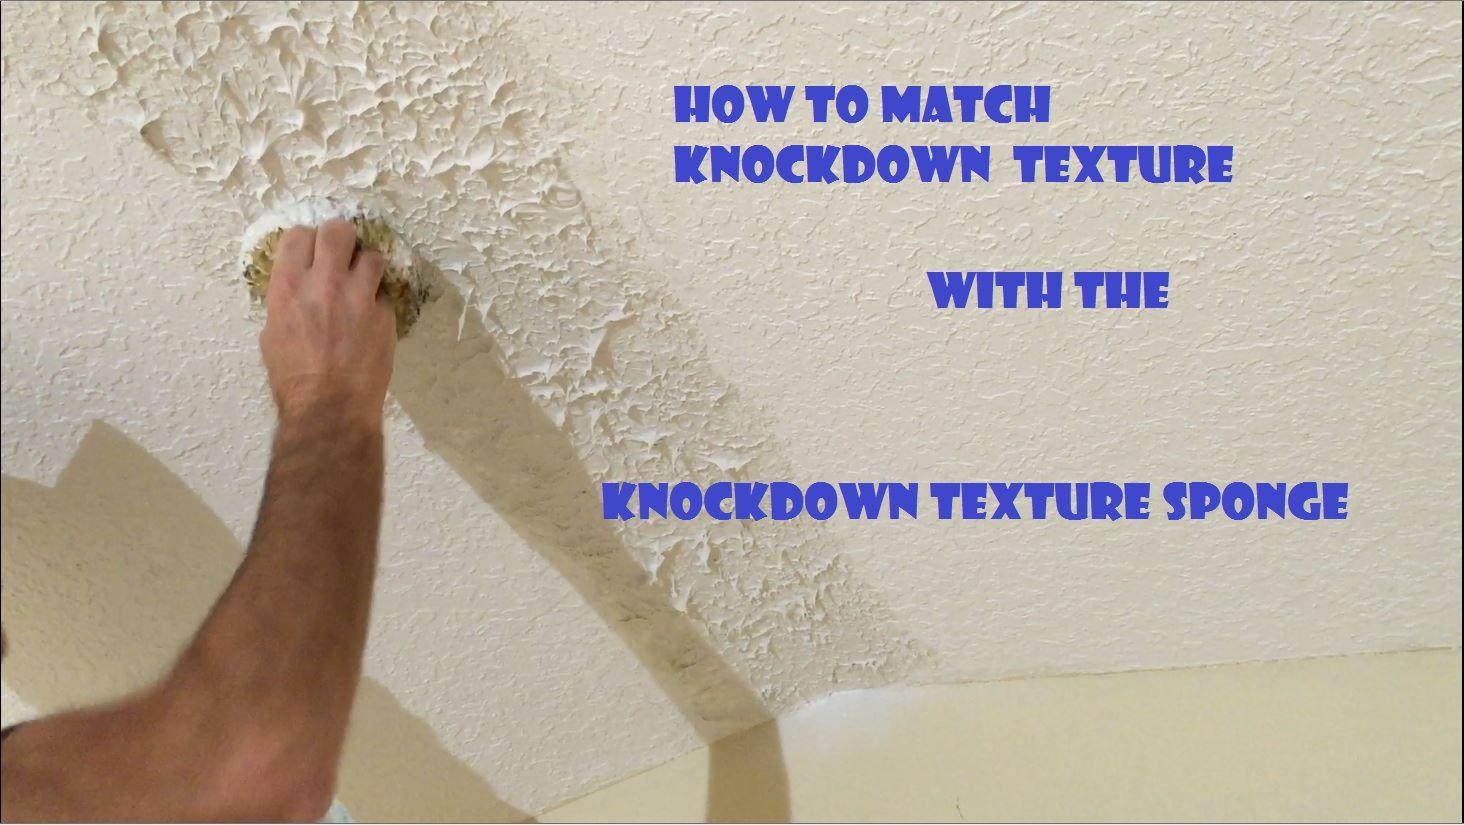 Knockdown Texture Sponge Drywall Repair Tool Drywall Repair Knockdown Texture Drywall Texture